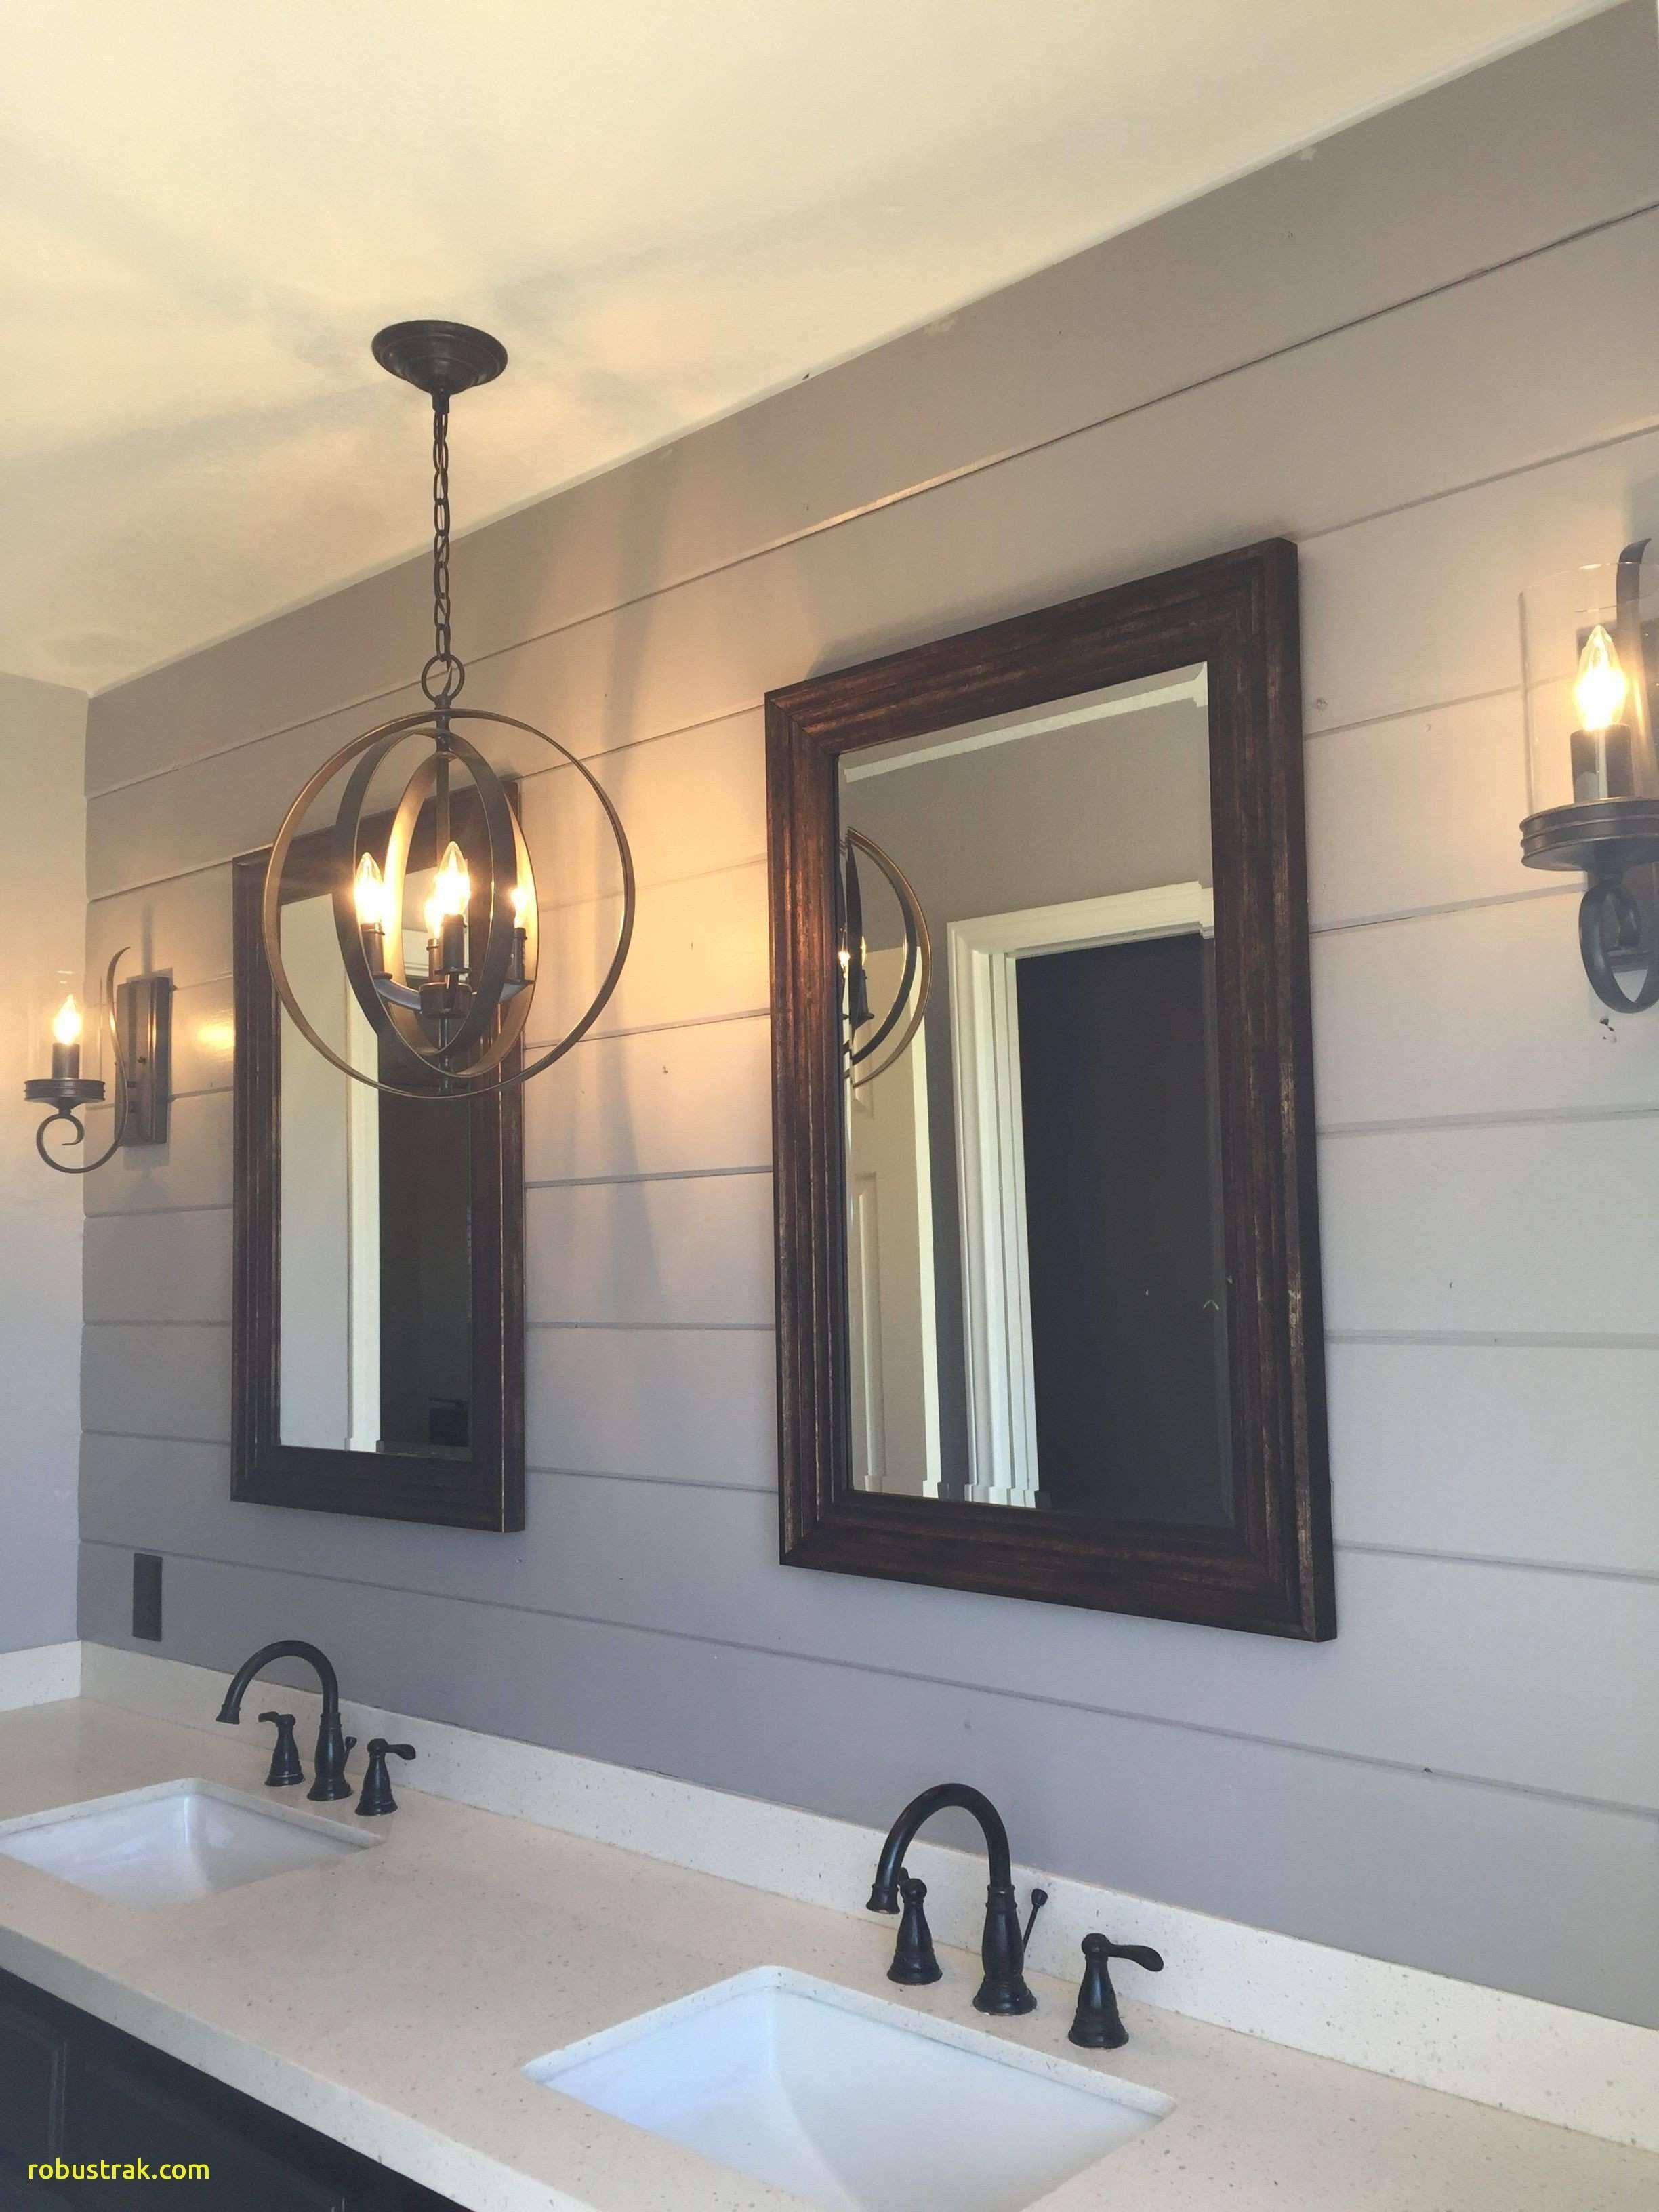 Pretty Photo Of Designer Bathroom Light Fixtures Rustic Bathroom Decor Guest Bathroom Decor Shiplap Bathroom